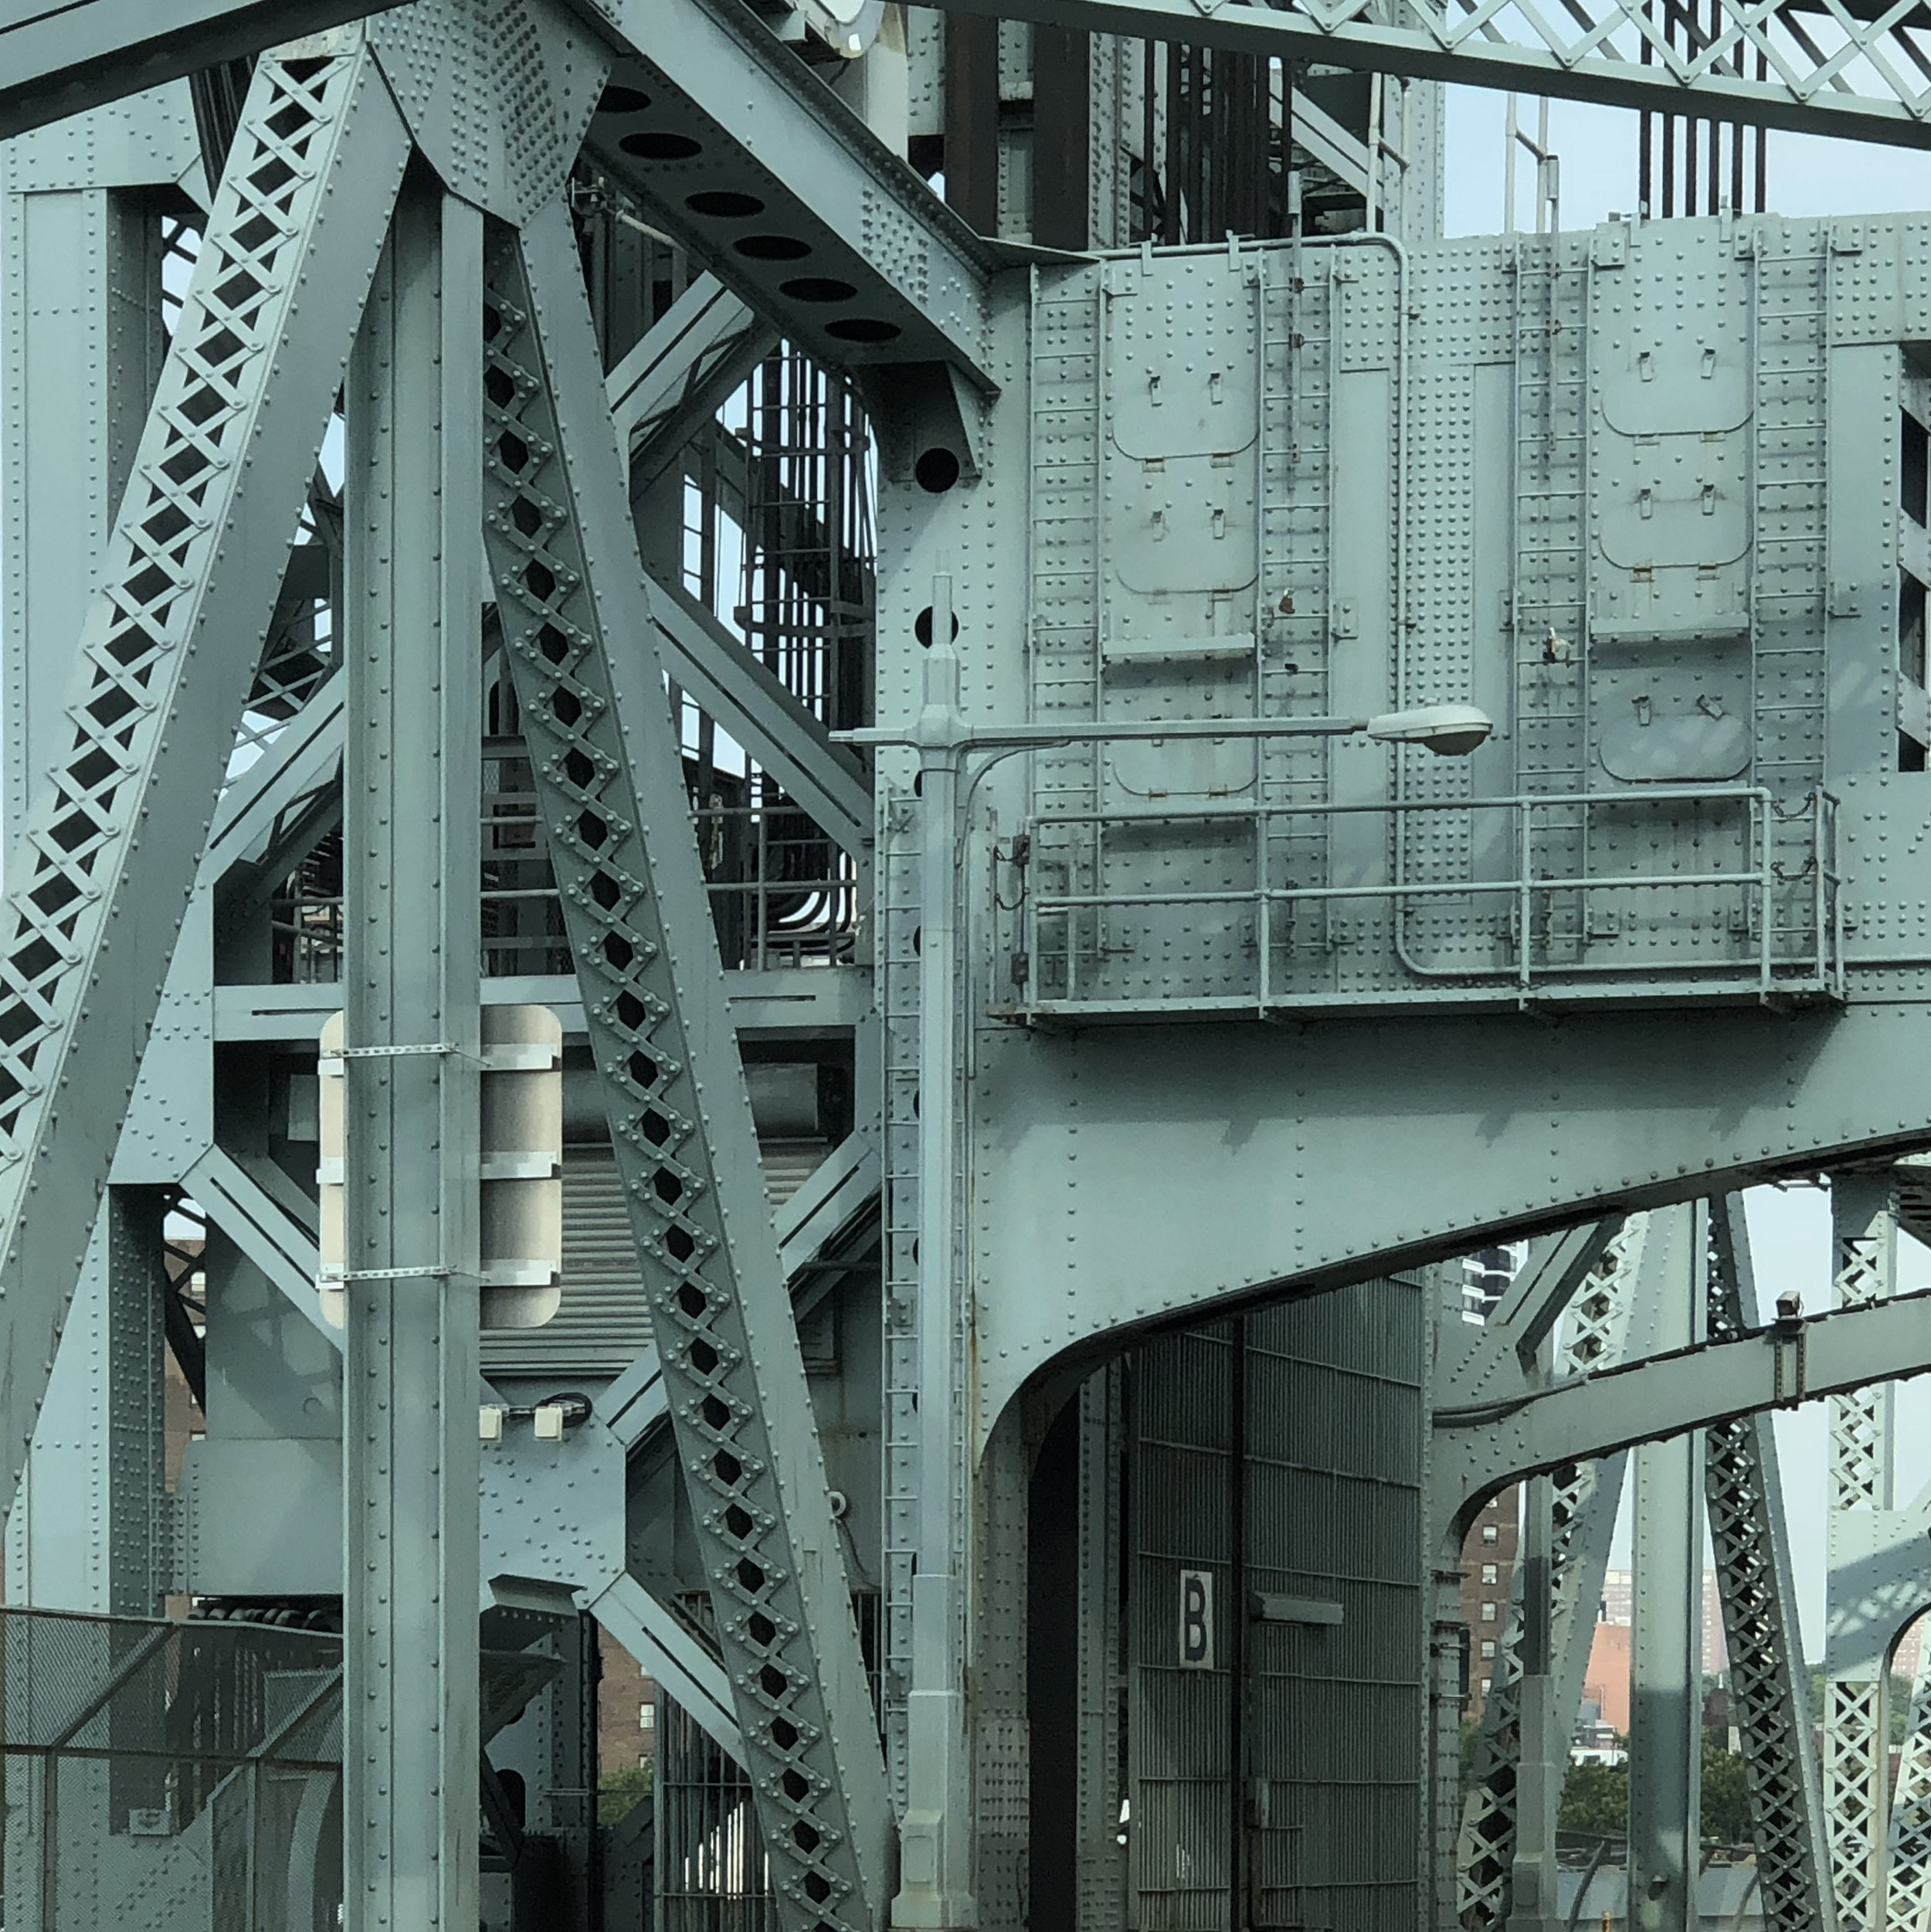 RFK Bridge (Triboro Bridge)